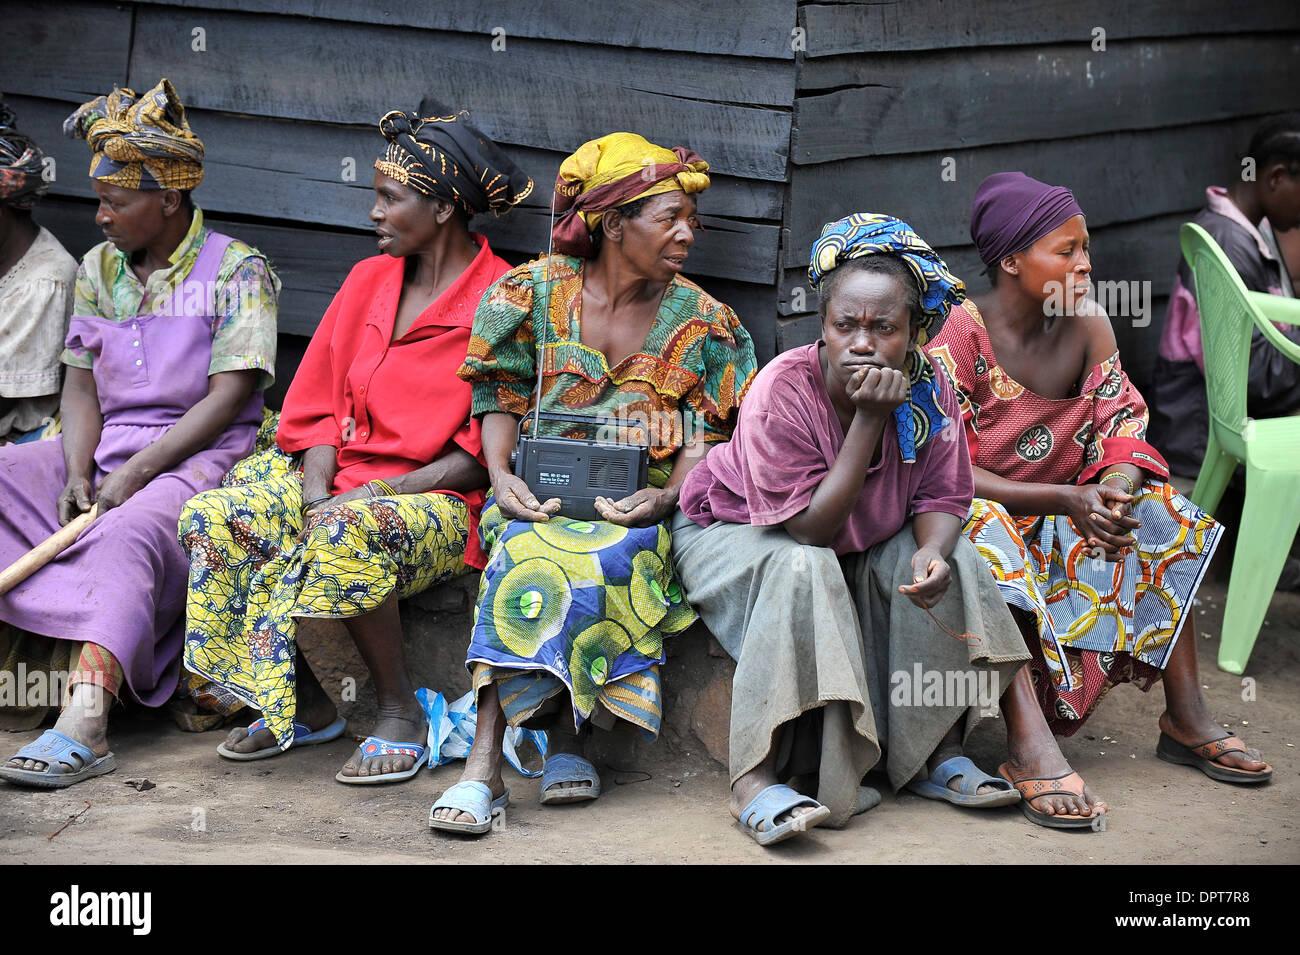 Mar  25, 2009 - Goma, DEM  REP  OF THE CONGO - Rape victims